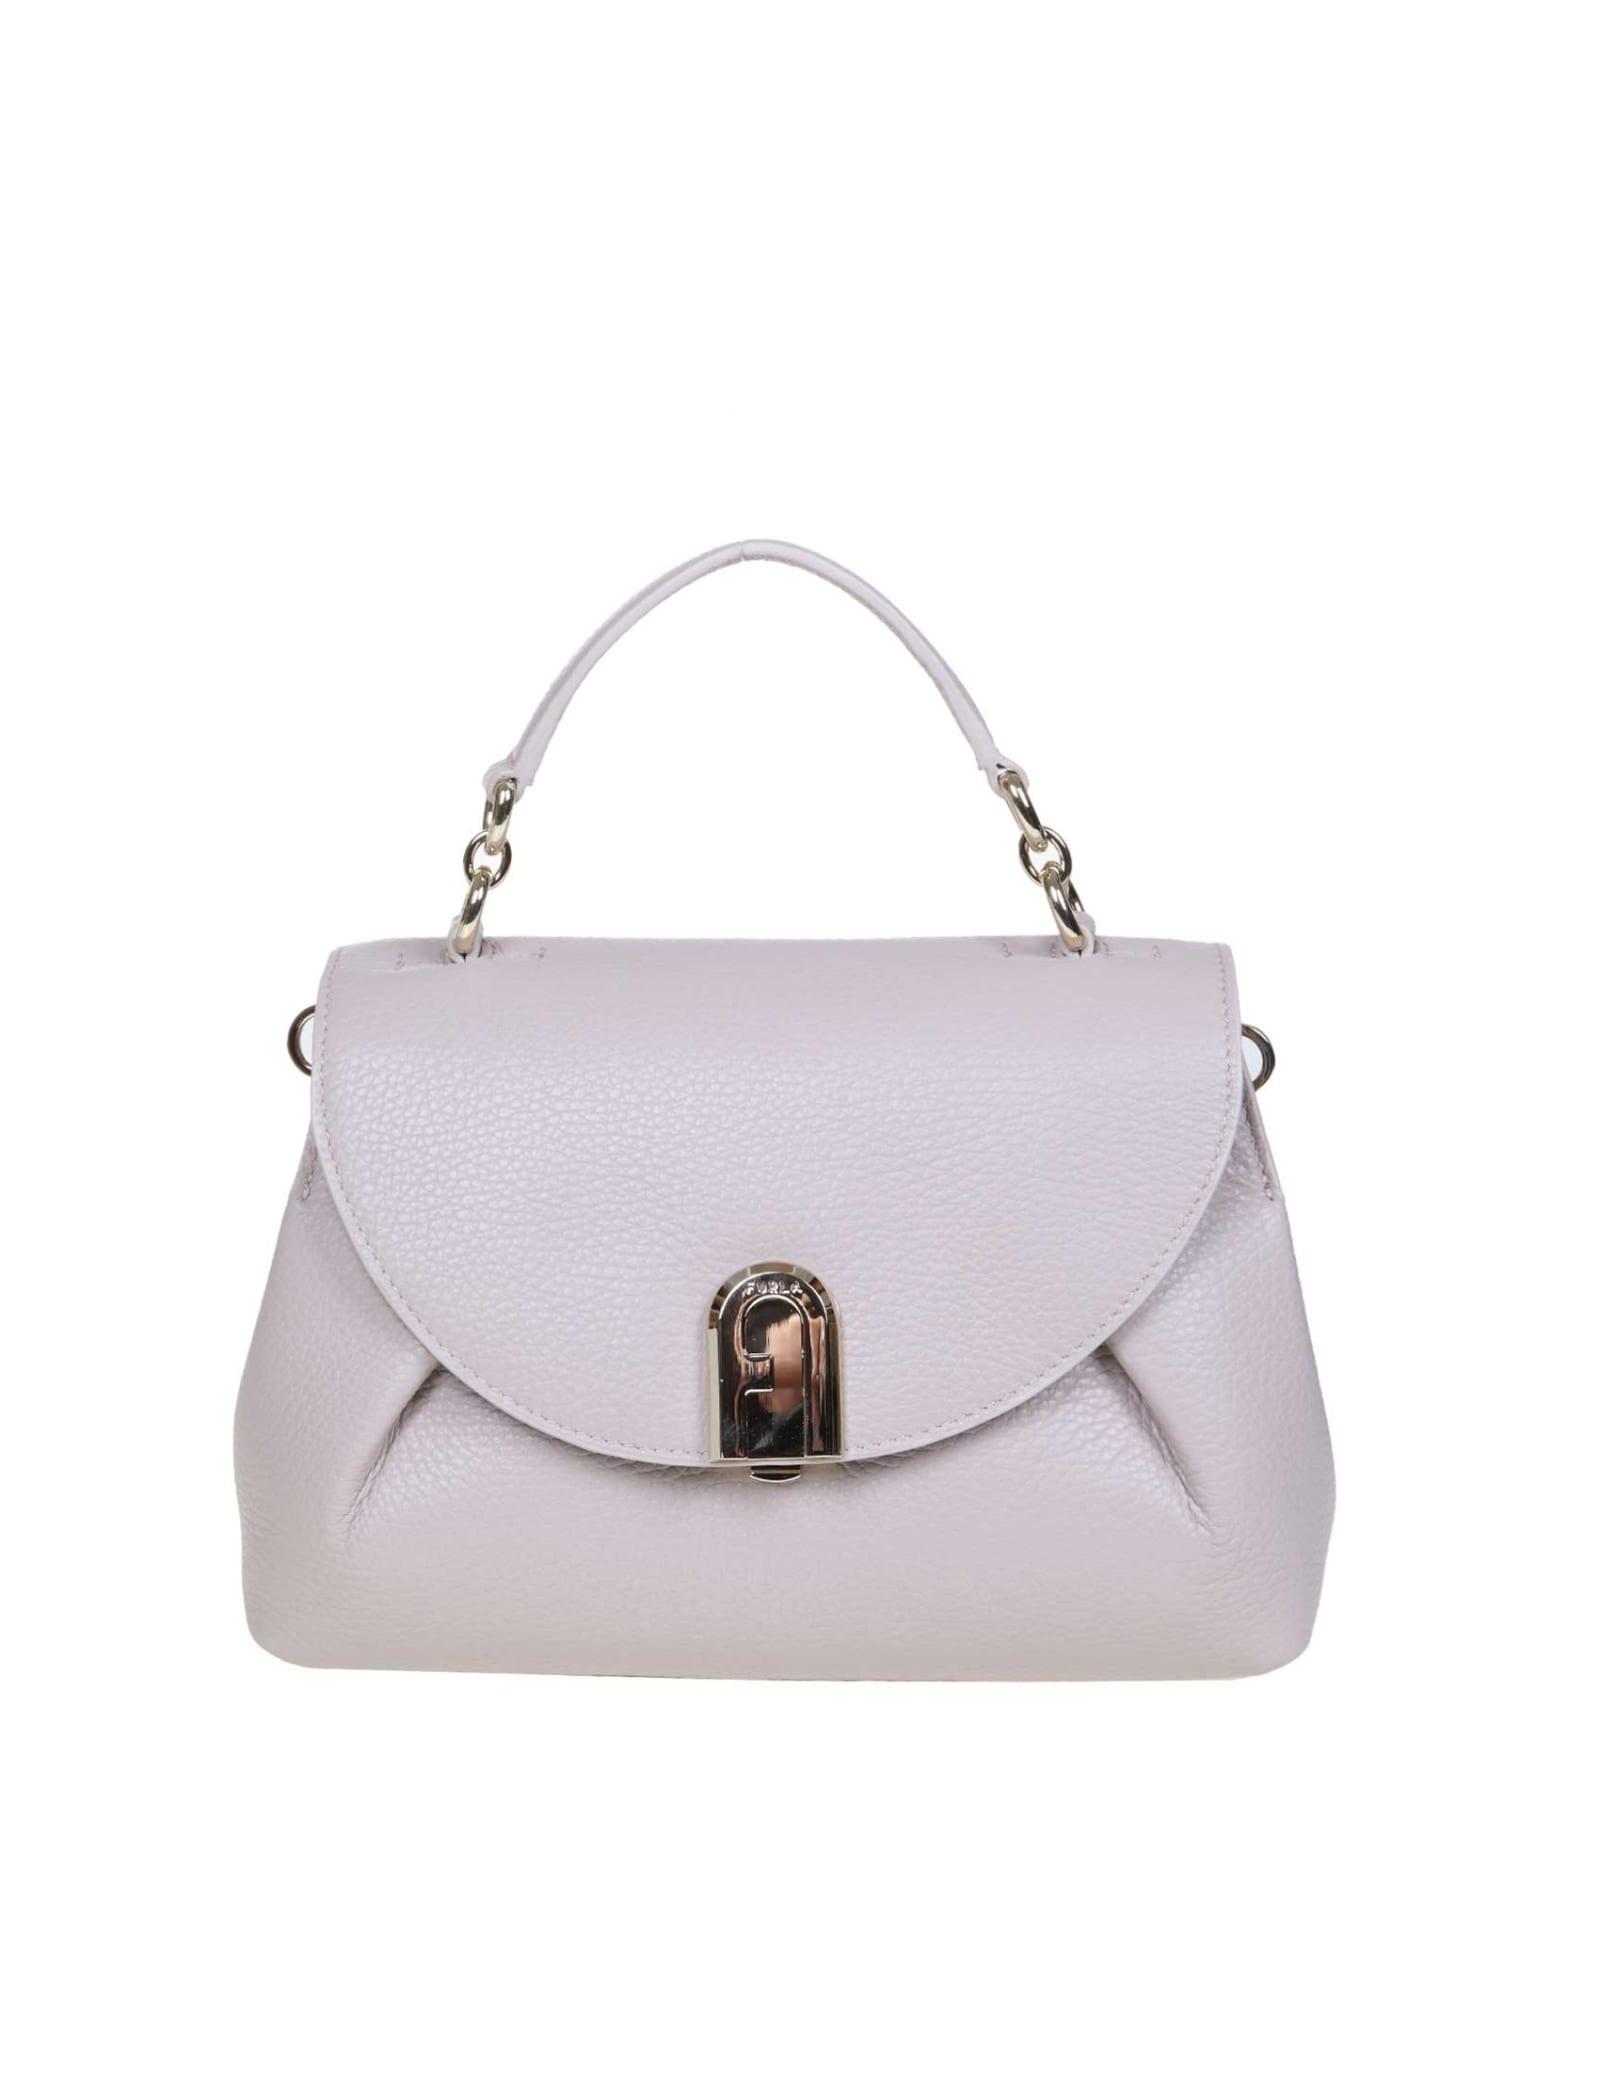 Furla Sleek S Hand Bag In Beige Color Leather